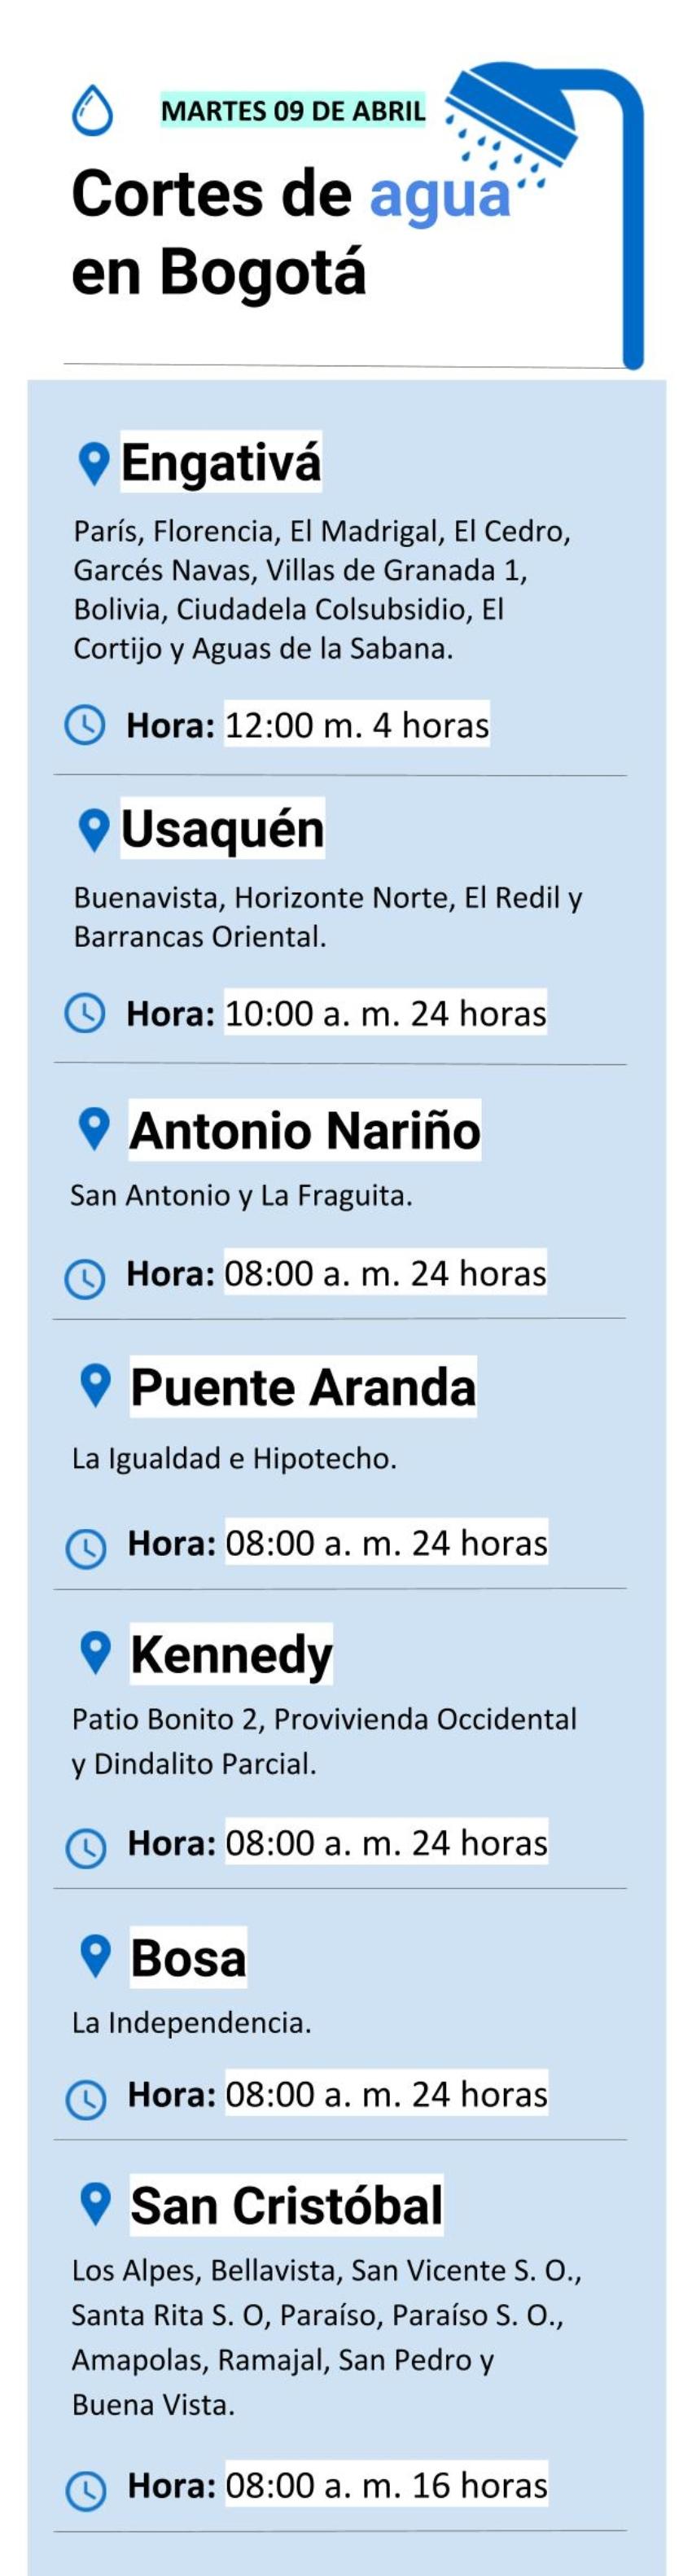 Cortes de agua en Bogotá martes 9 de abril